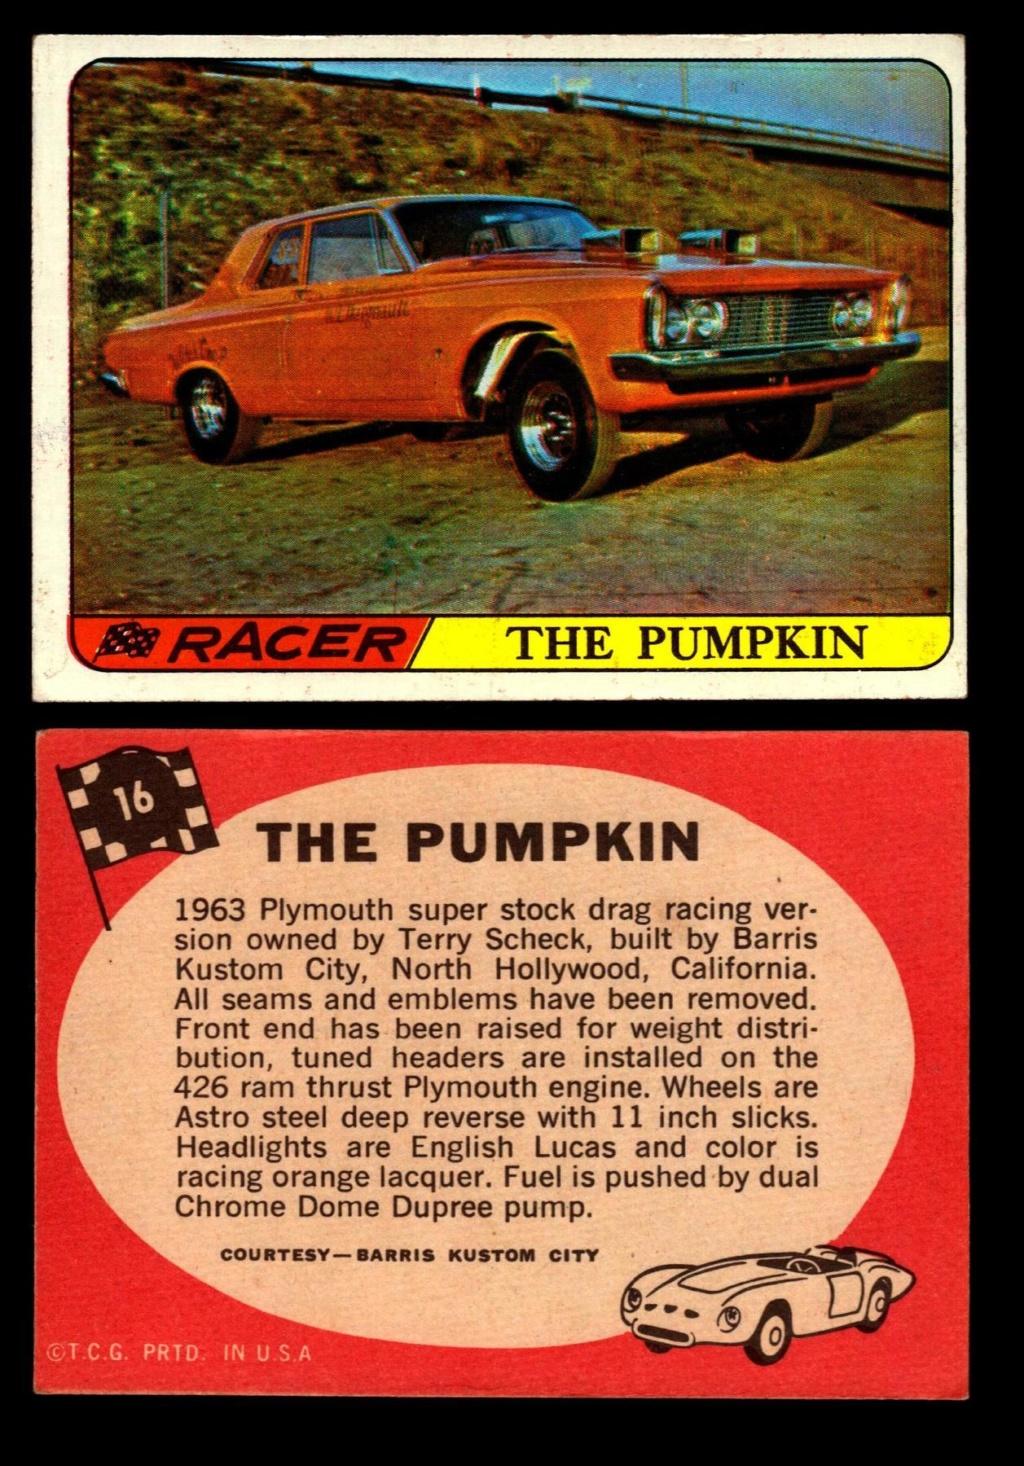 Hot Rods Topps - Vintage Trading Cards 1968 - Custom car - Dragster - Racer - Dream car - Barris Kustom City - Ed Roth Darrill Starbird, Gene Winfield, Bill Cuchenberry 16_7e210